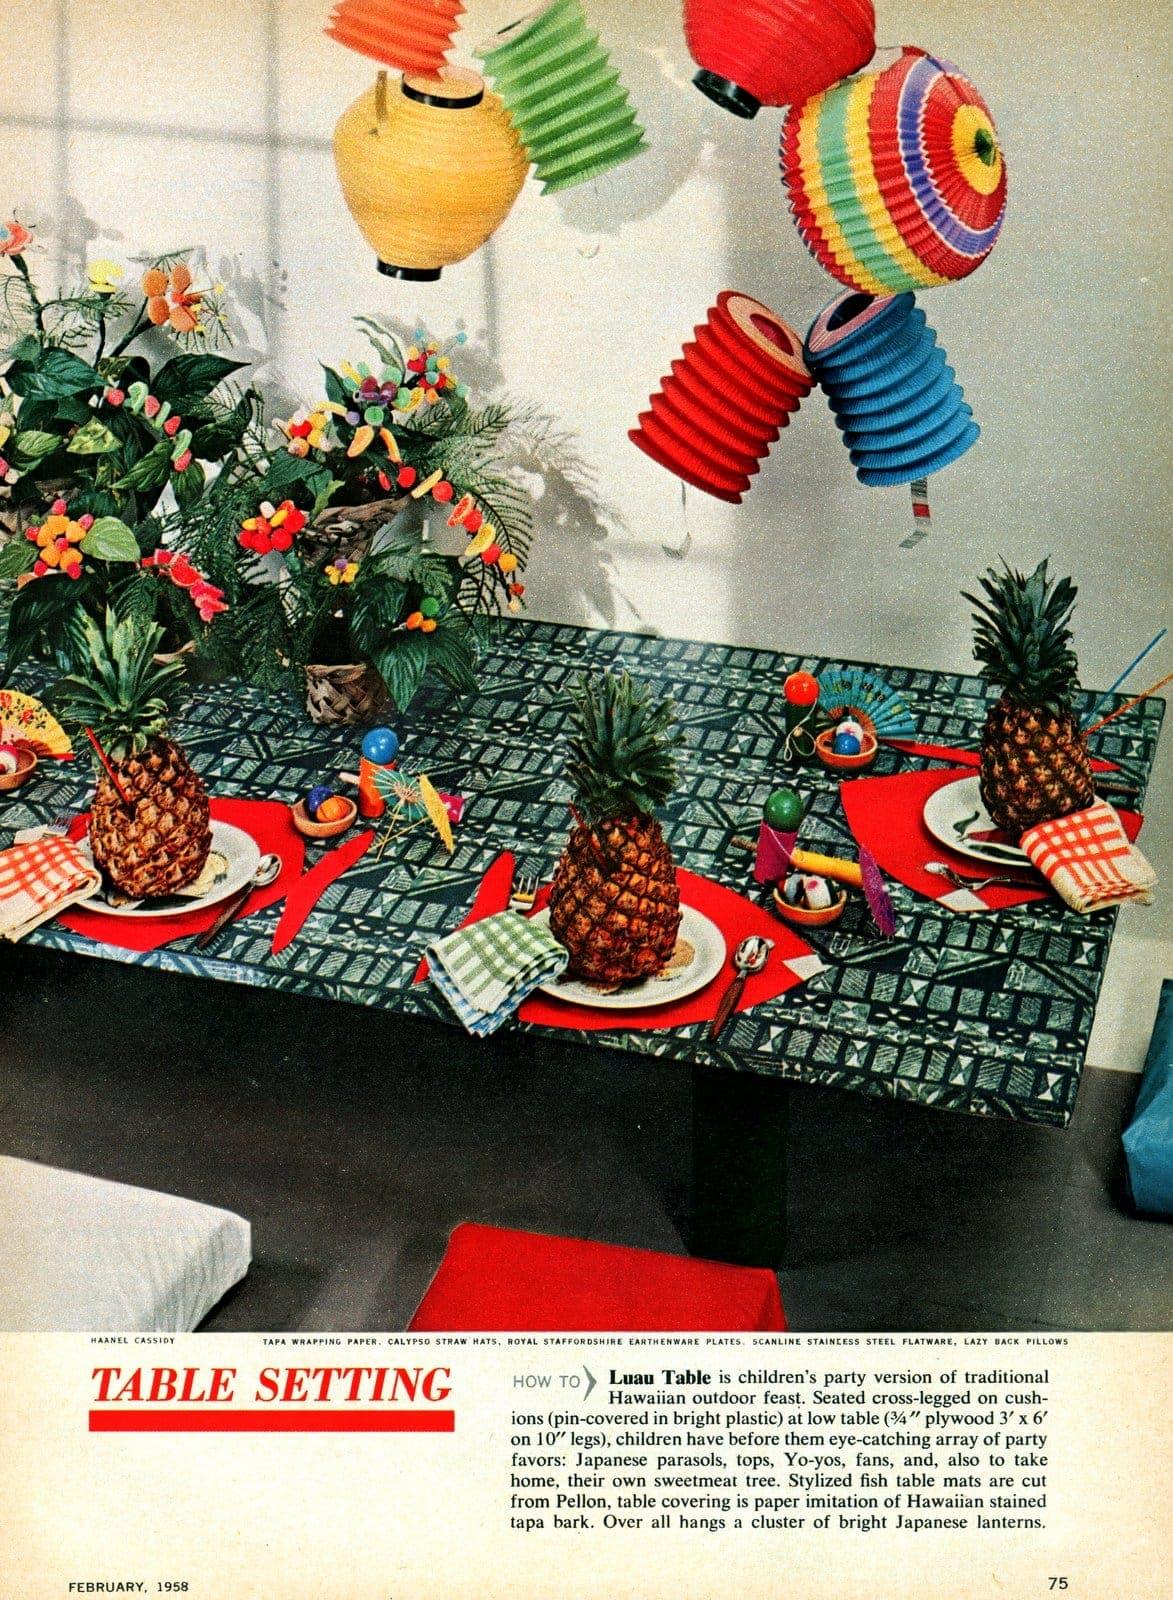 How to have a retro Hawaiian luau party (1)